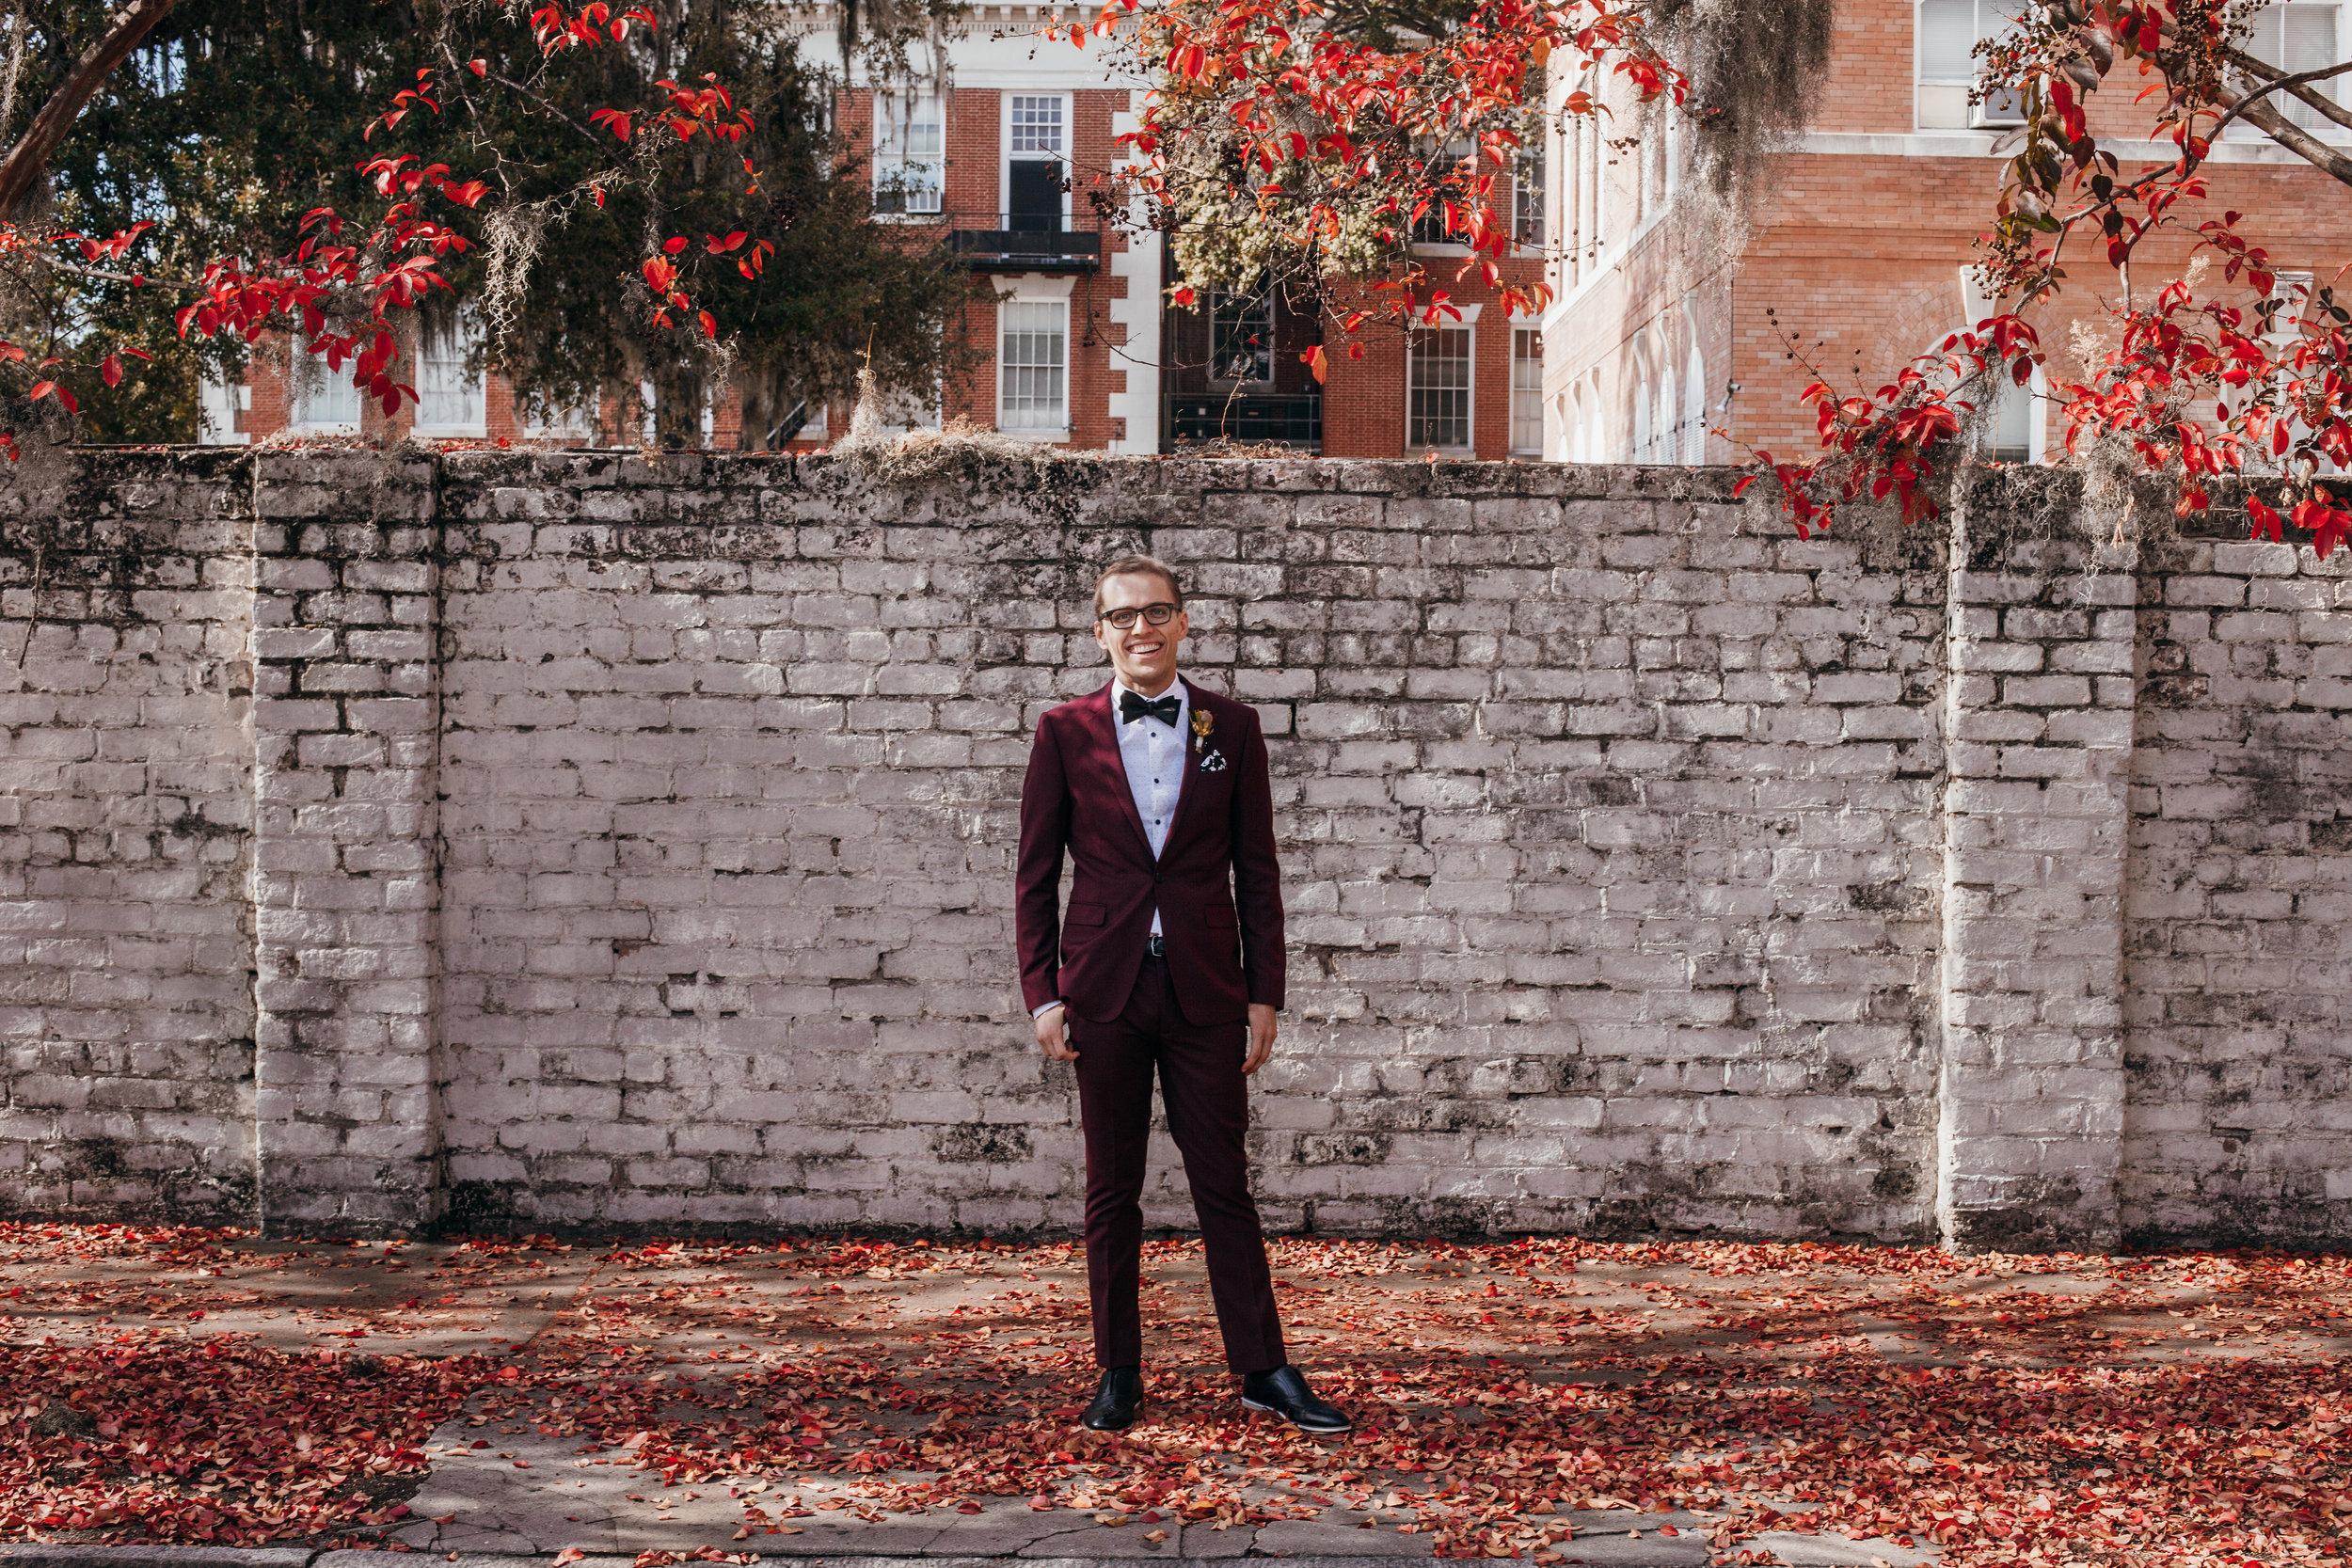 julia-hembree-photography-eden-village-church-wedding-savannah-warehouse-wedding-ivory-and-beau-bridal-boutique-savannah-florist-savannah-wedding-planner-savannah-event-design-scad-wedding-artist-wedding-savannah-funky-wedding-handmade-wedding-28.jpg